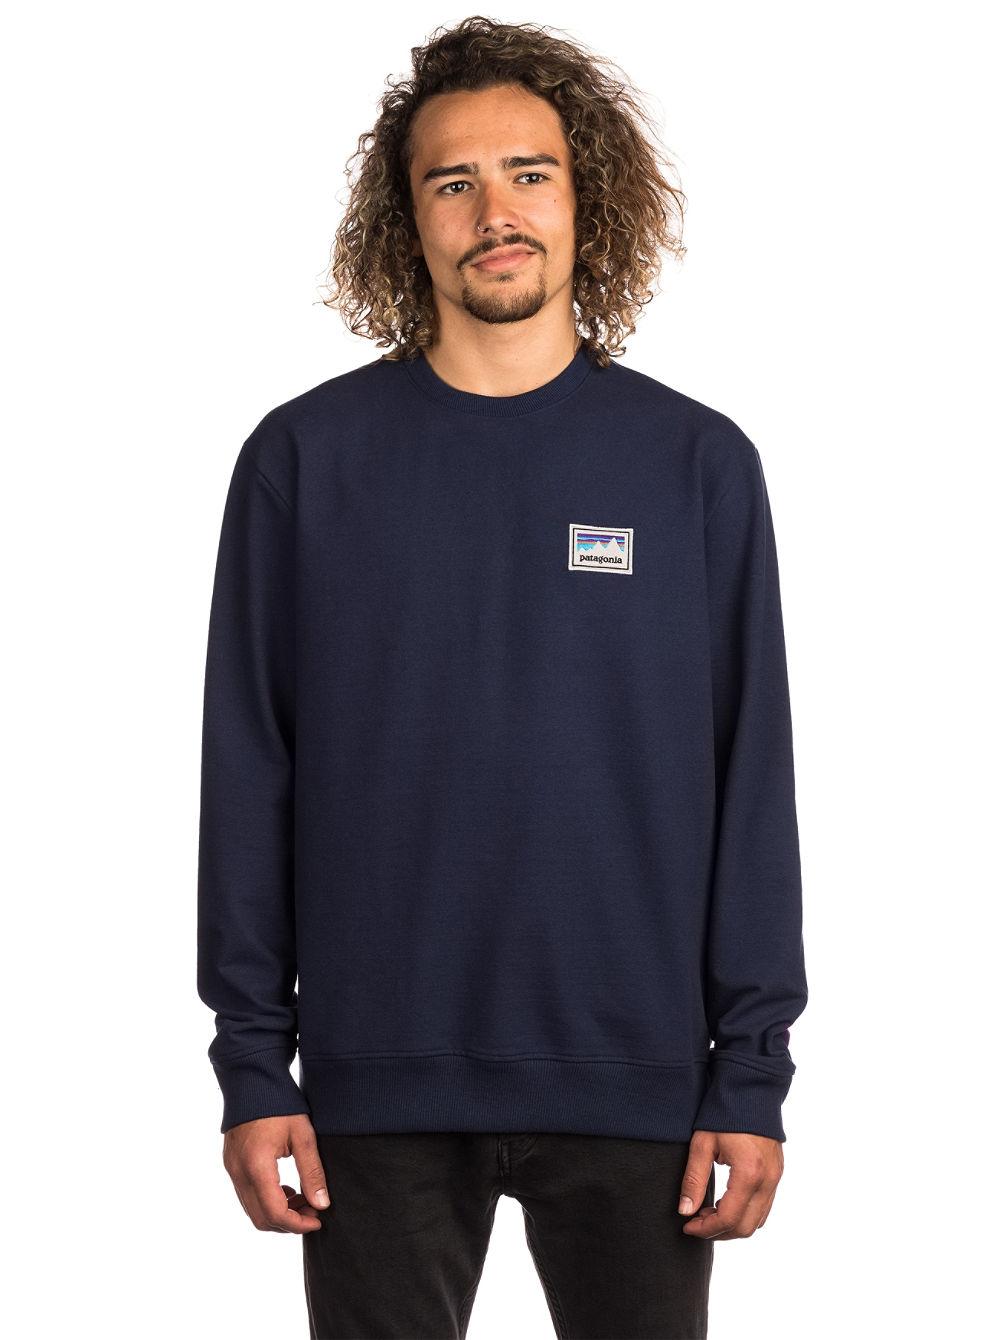 watch ee3e4 3ca89 Shop Sticker Patch Uprisal Crew Sweater